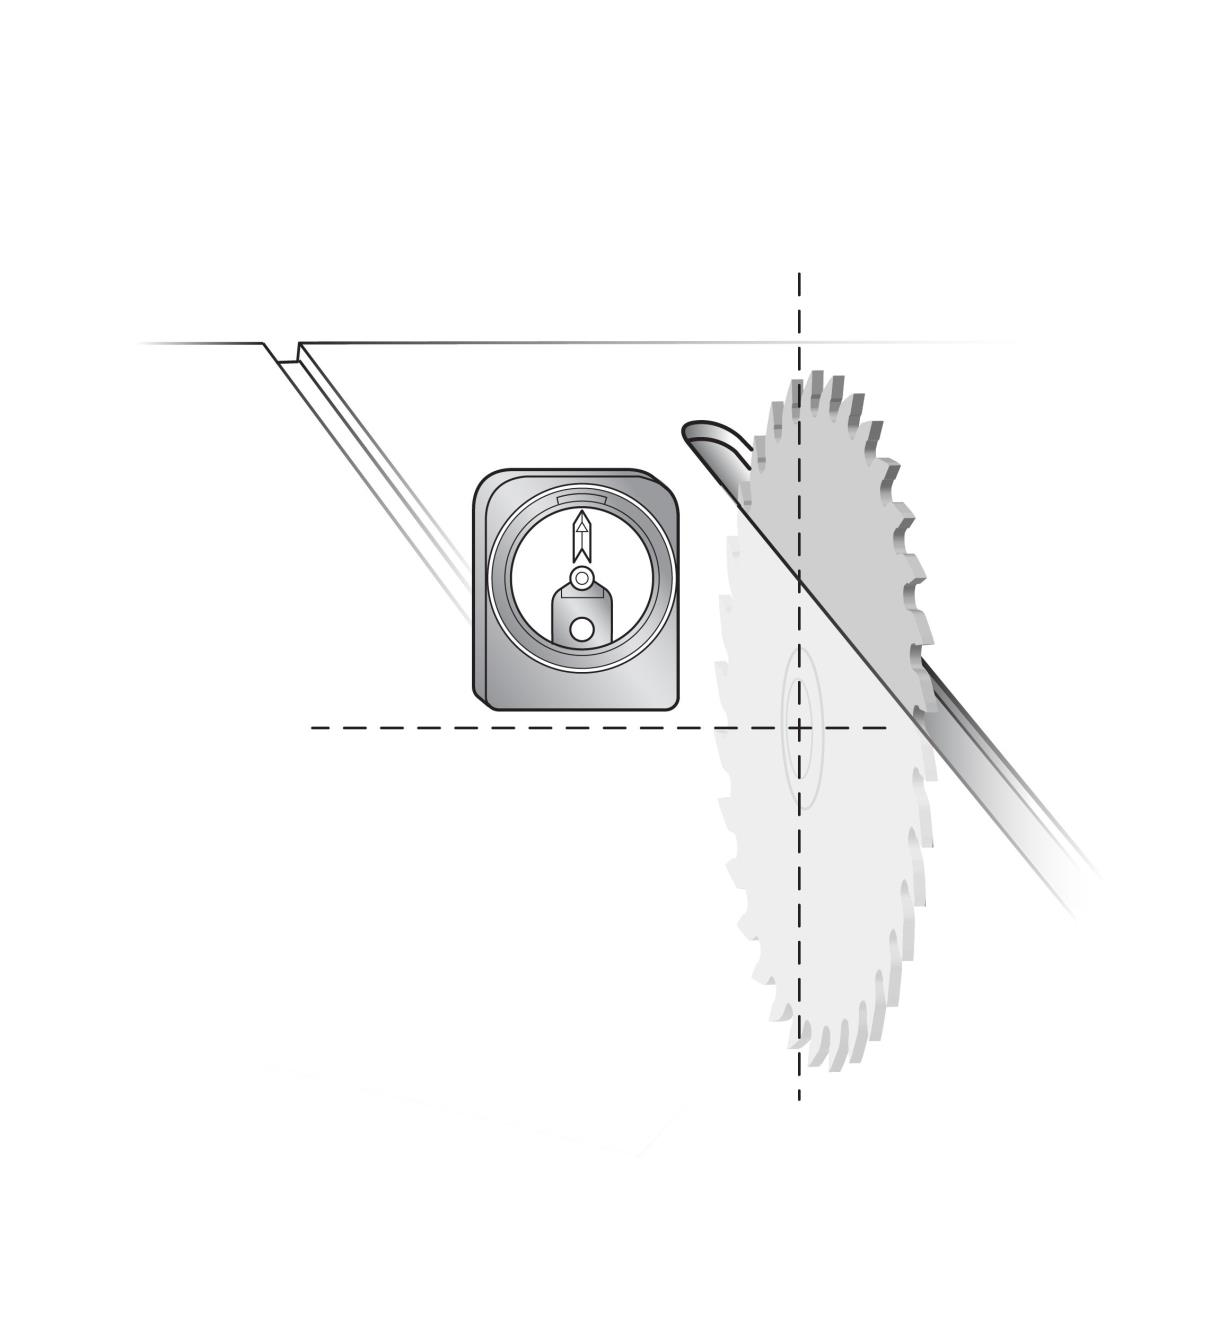 99N0501 - AcuAngle Angle Level